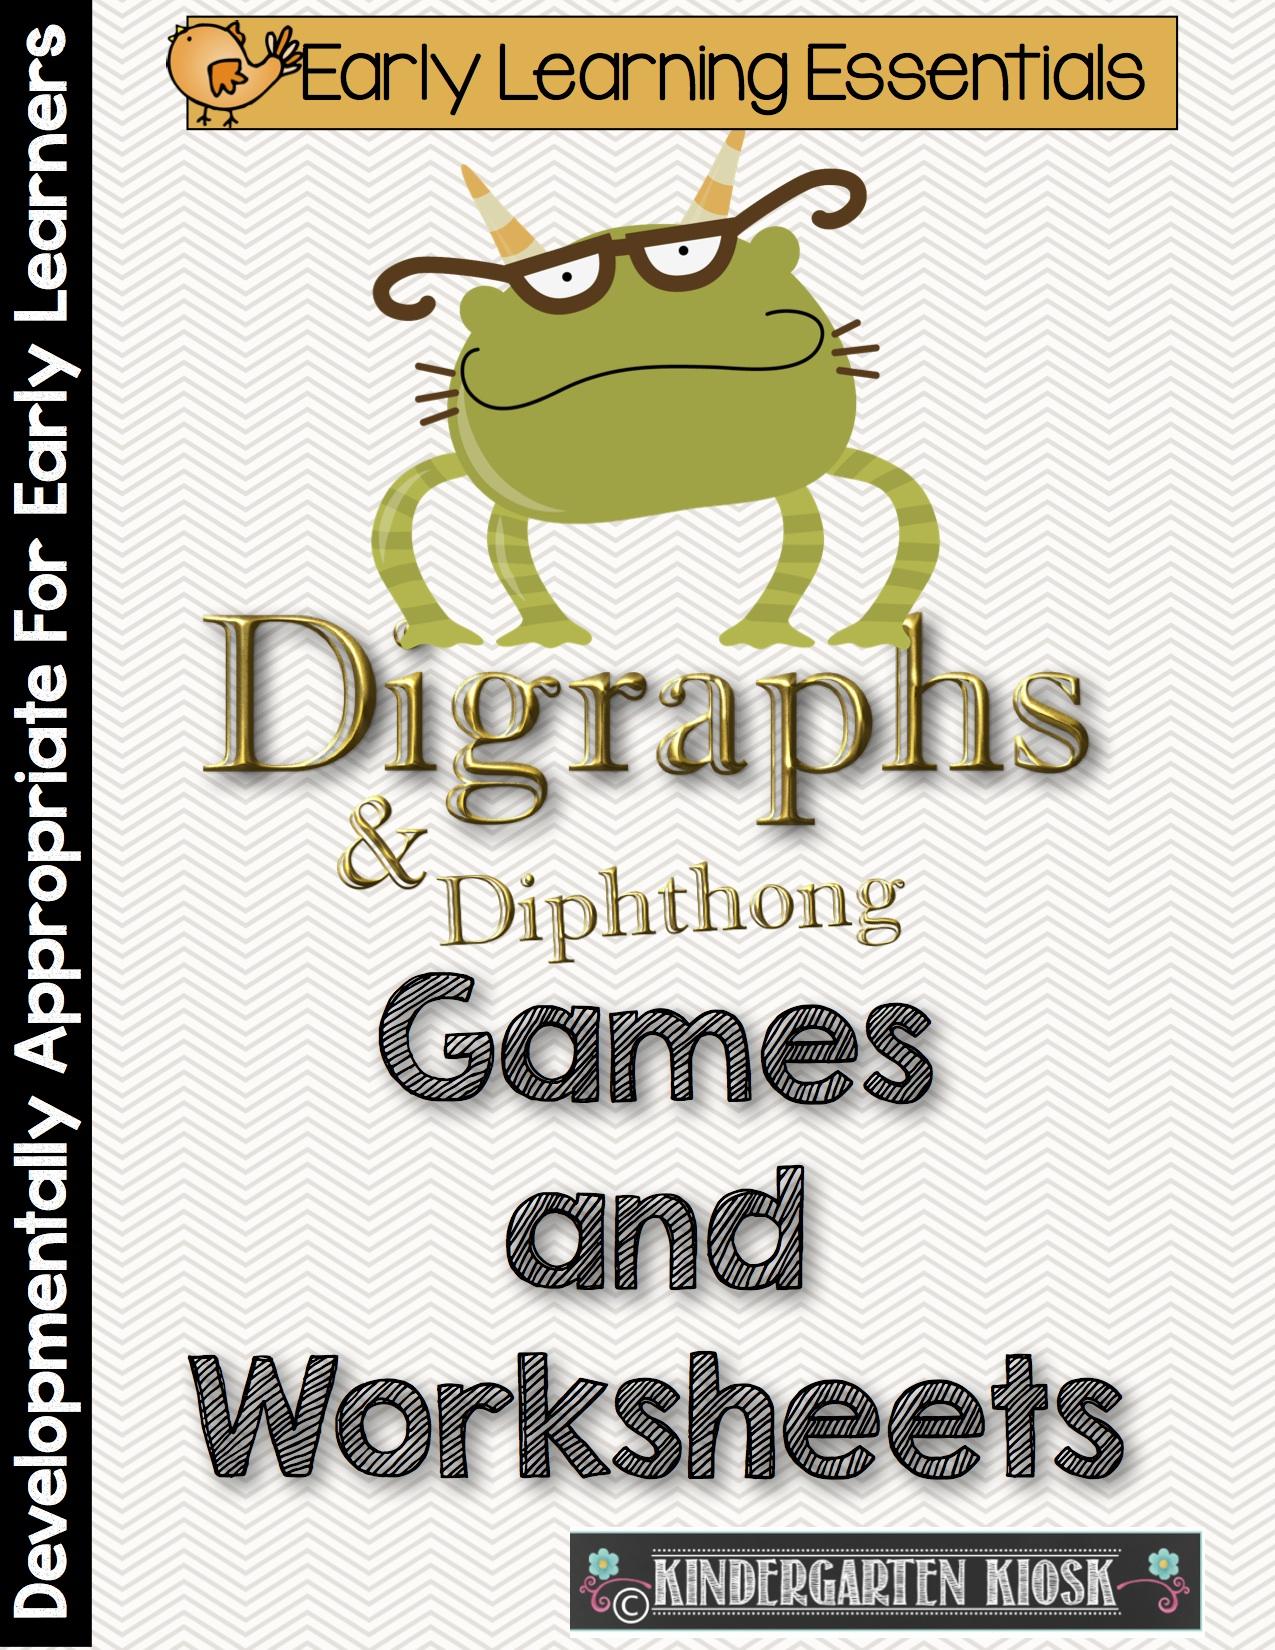 Diagraph and Diphthong Games Kindergarten Kiosk – Diphthongs Worksheets